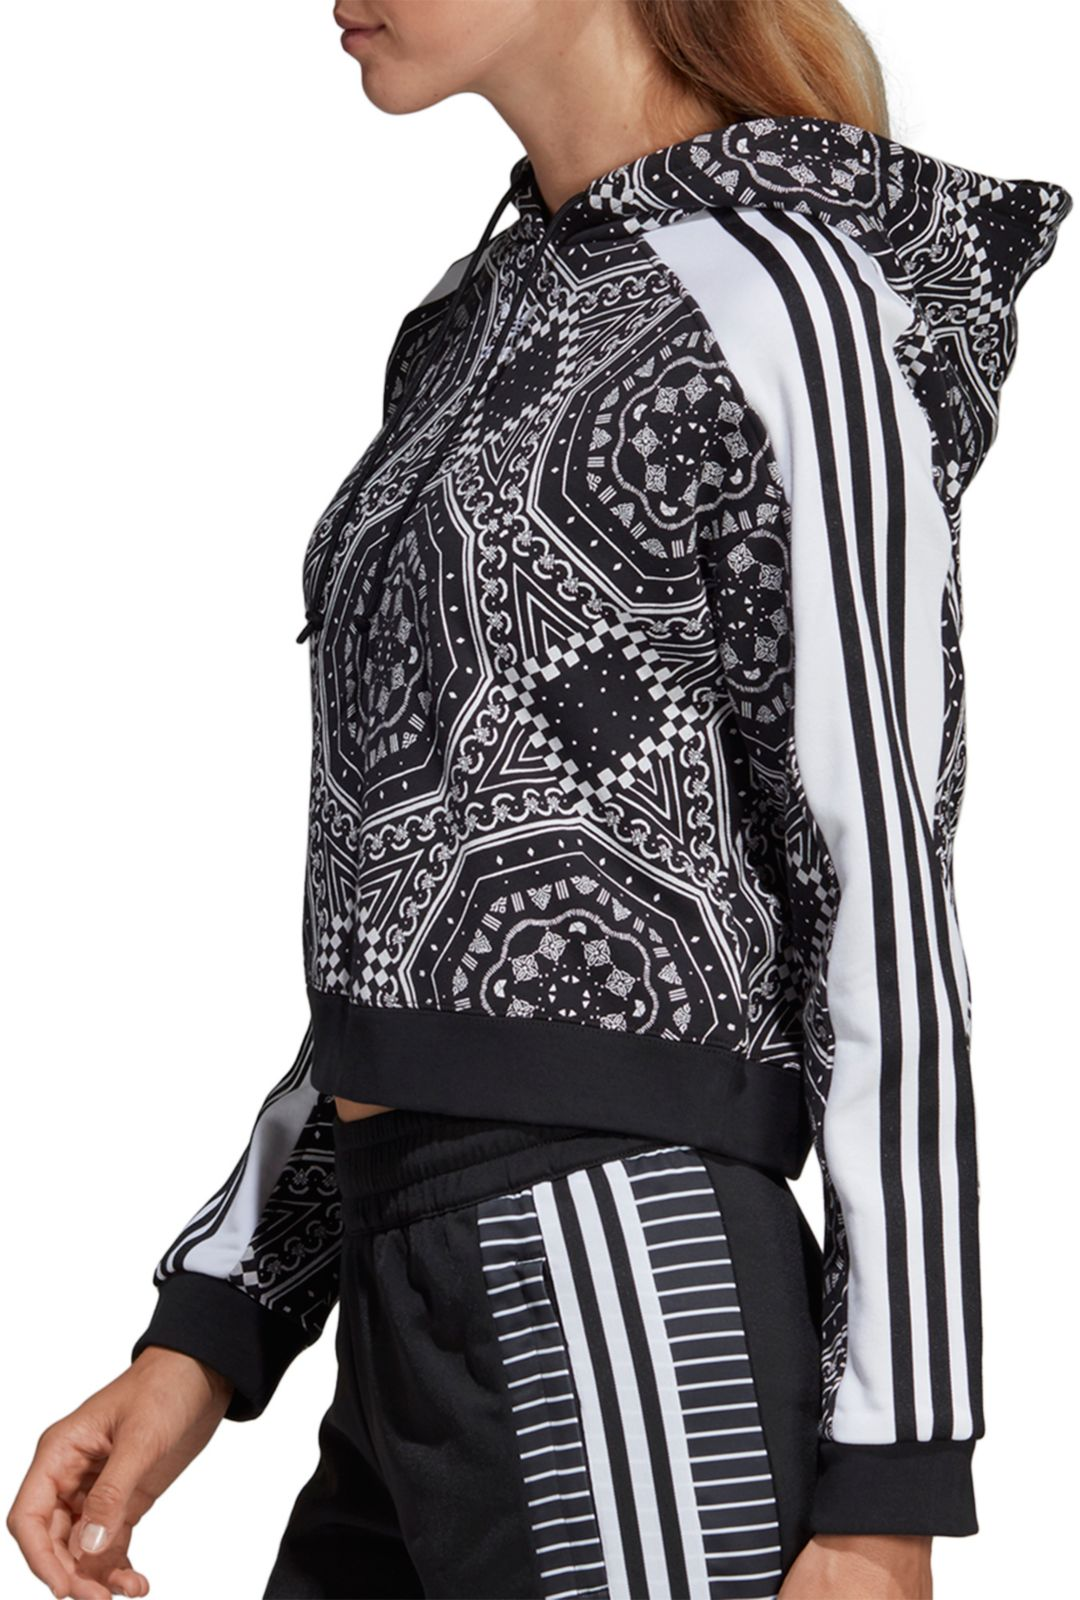 adidas Originals Women's Printed Cropped Hoodie